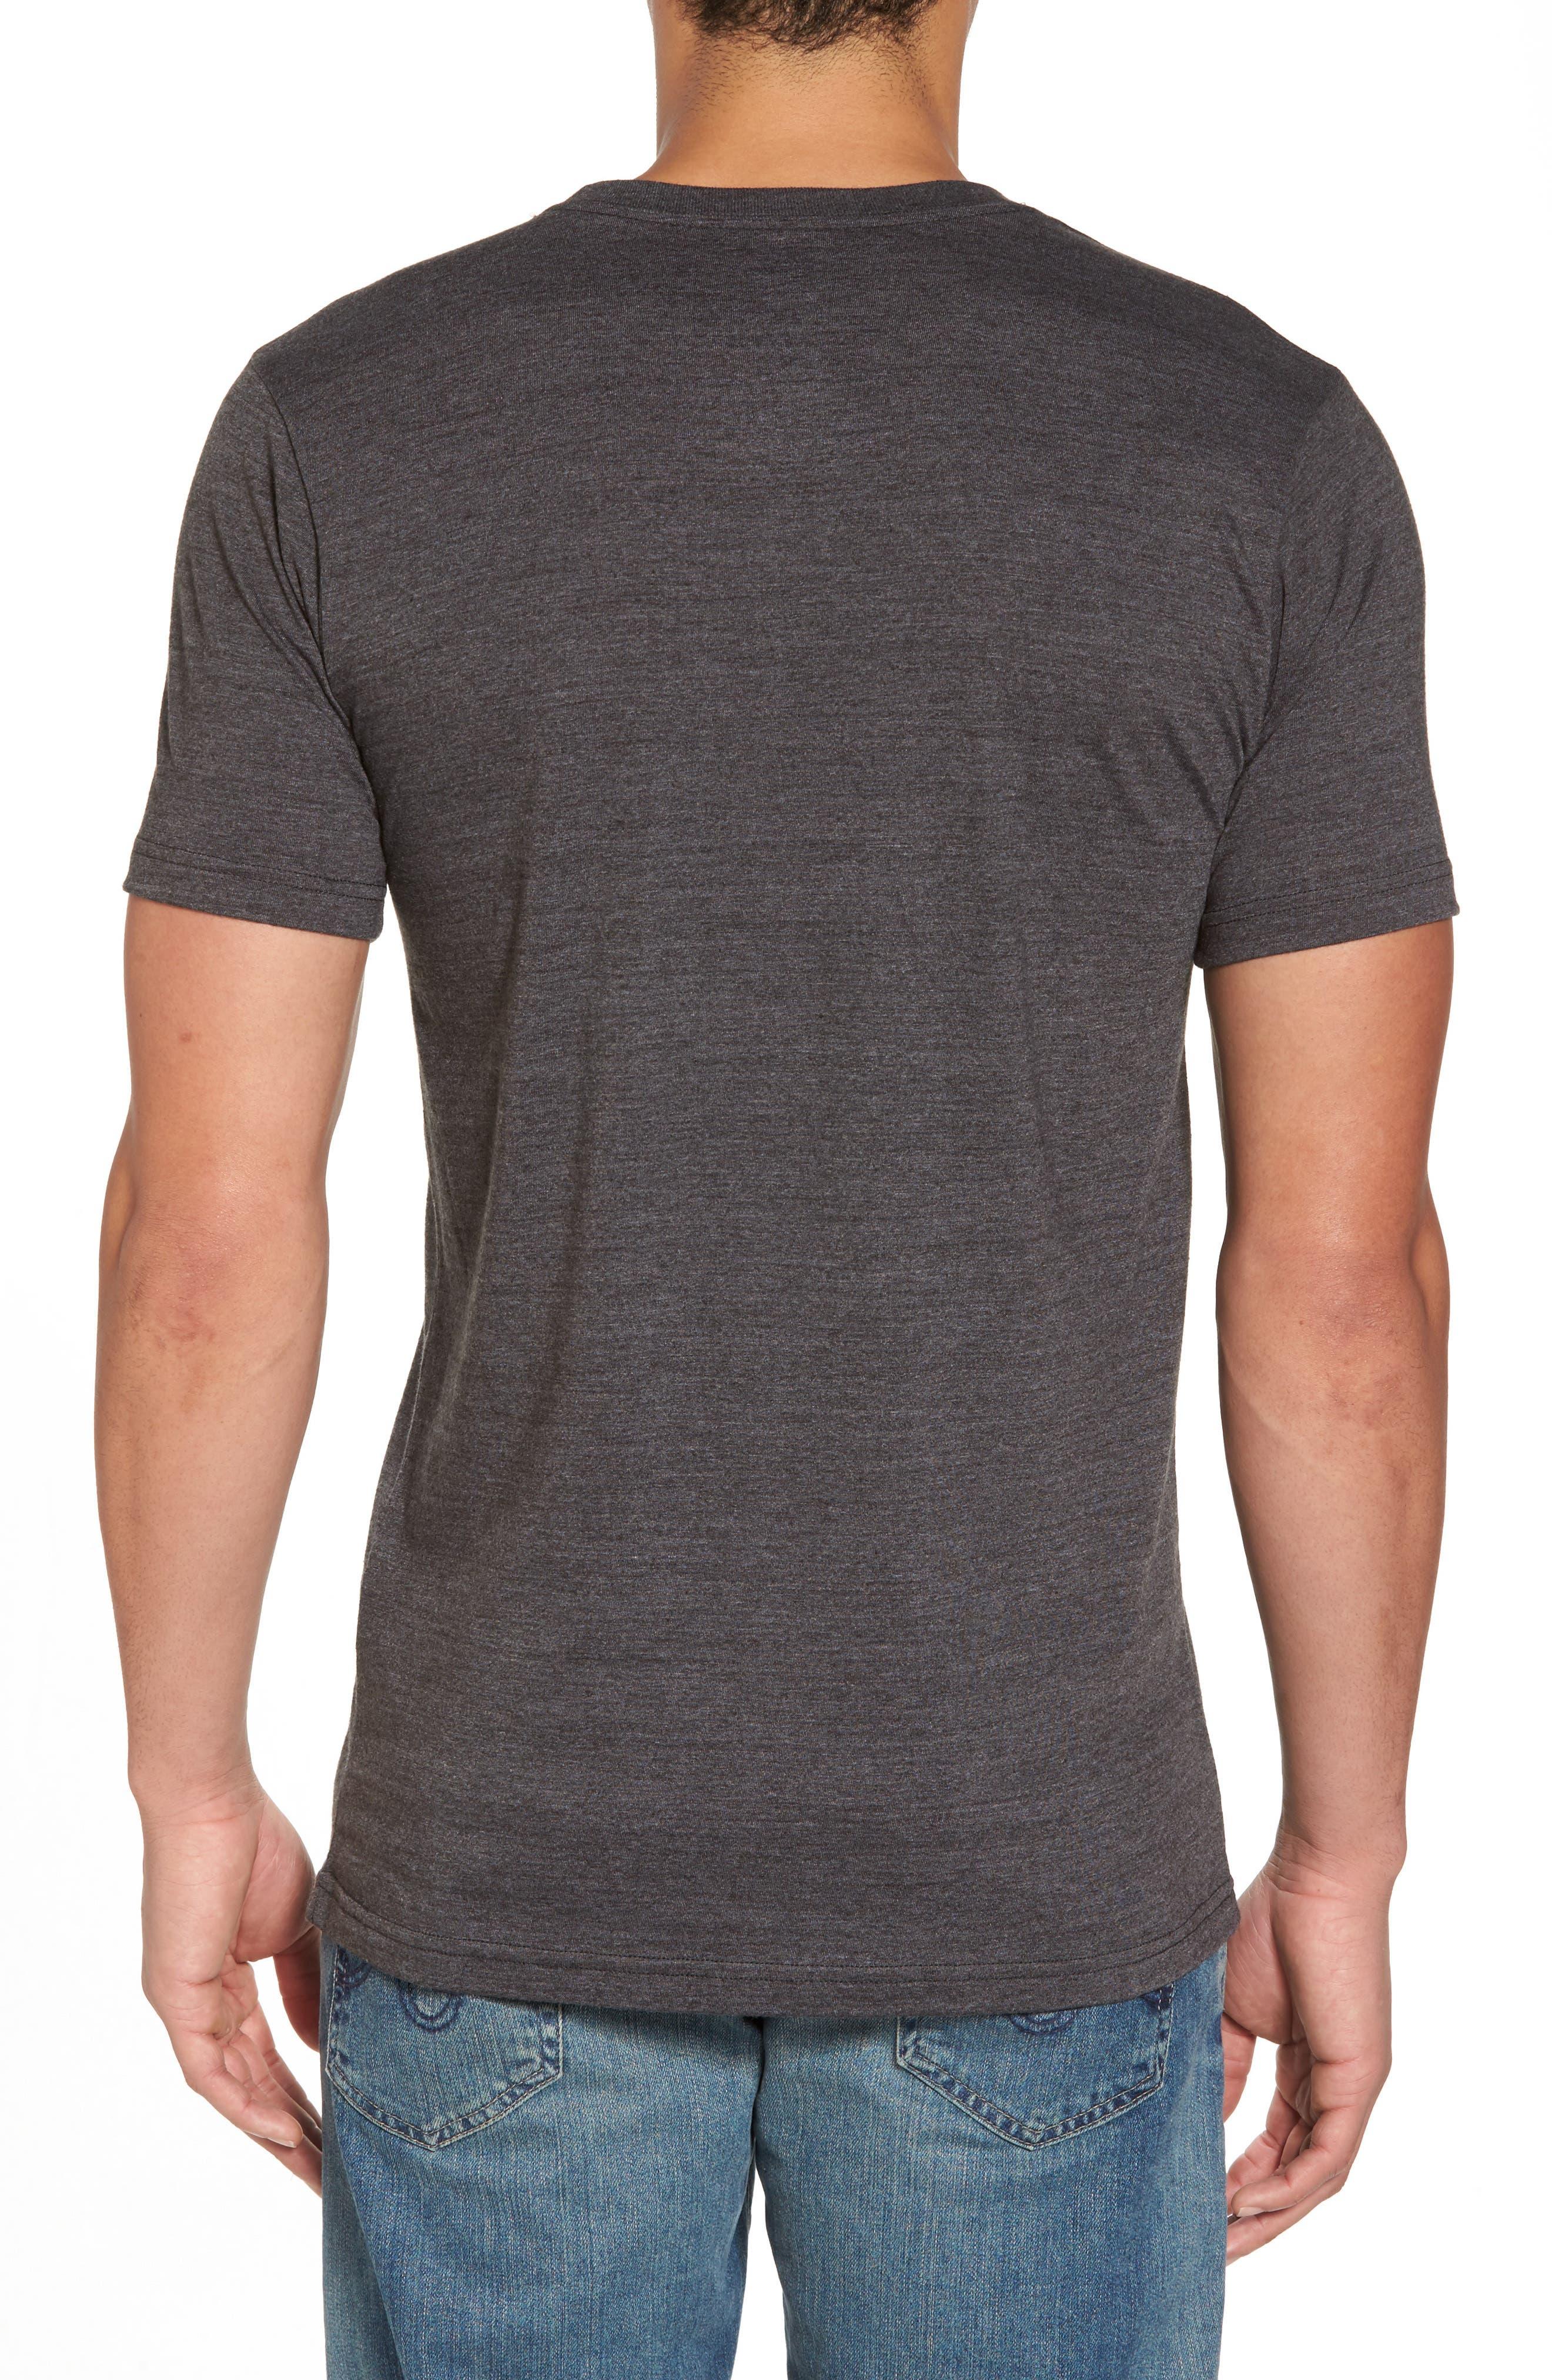 Half Dome T-Shirt,                             Alternate thumbnail 5, color,